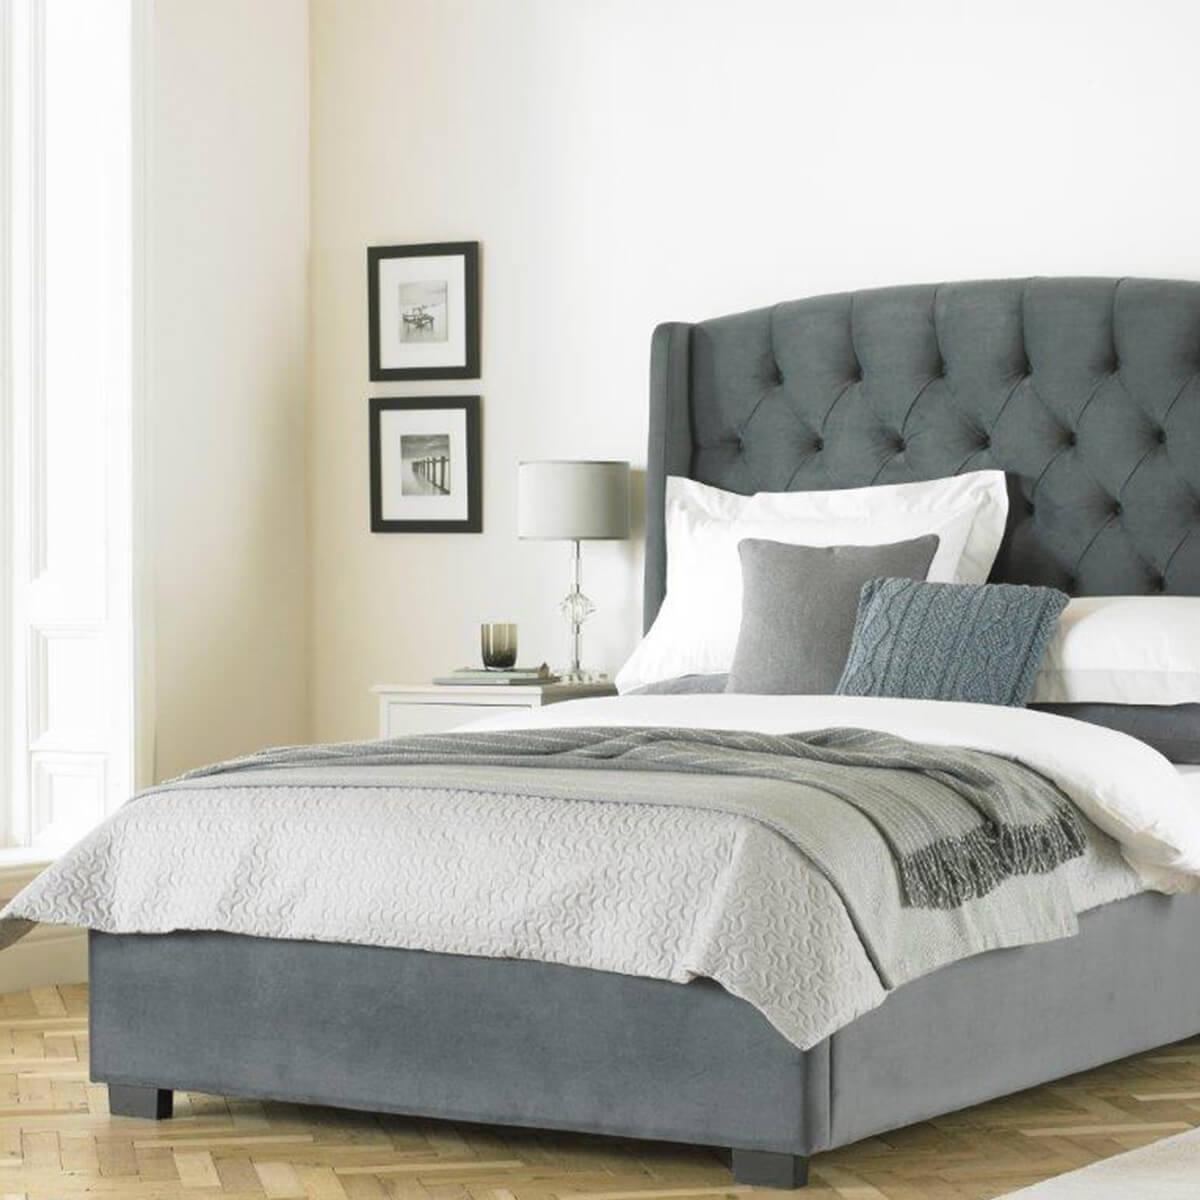 buckingham tall wing headboard grey velvet bed frame fads. Black Bedroom Furniture Sets. Home Design Ideas